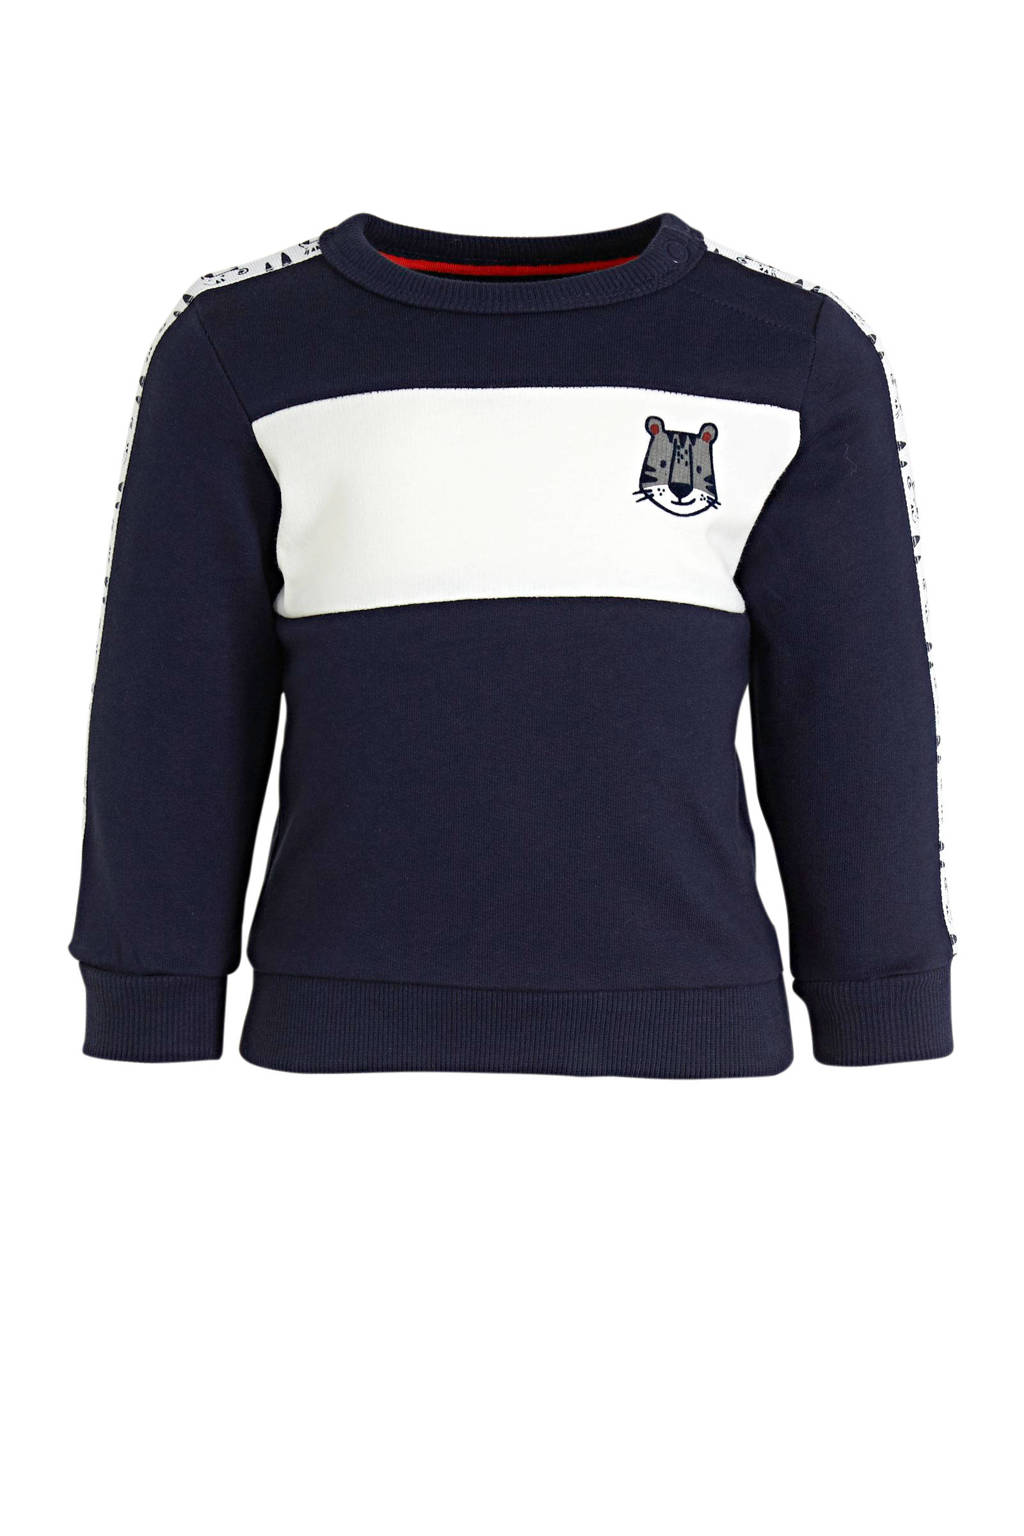 C&A Baby Club sweater met printopdruk donkerblauw/wit, Donkerblauw/wit